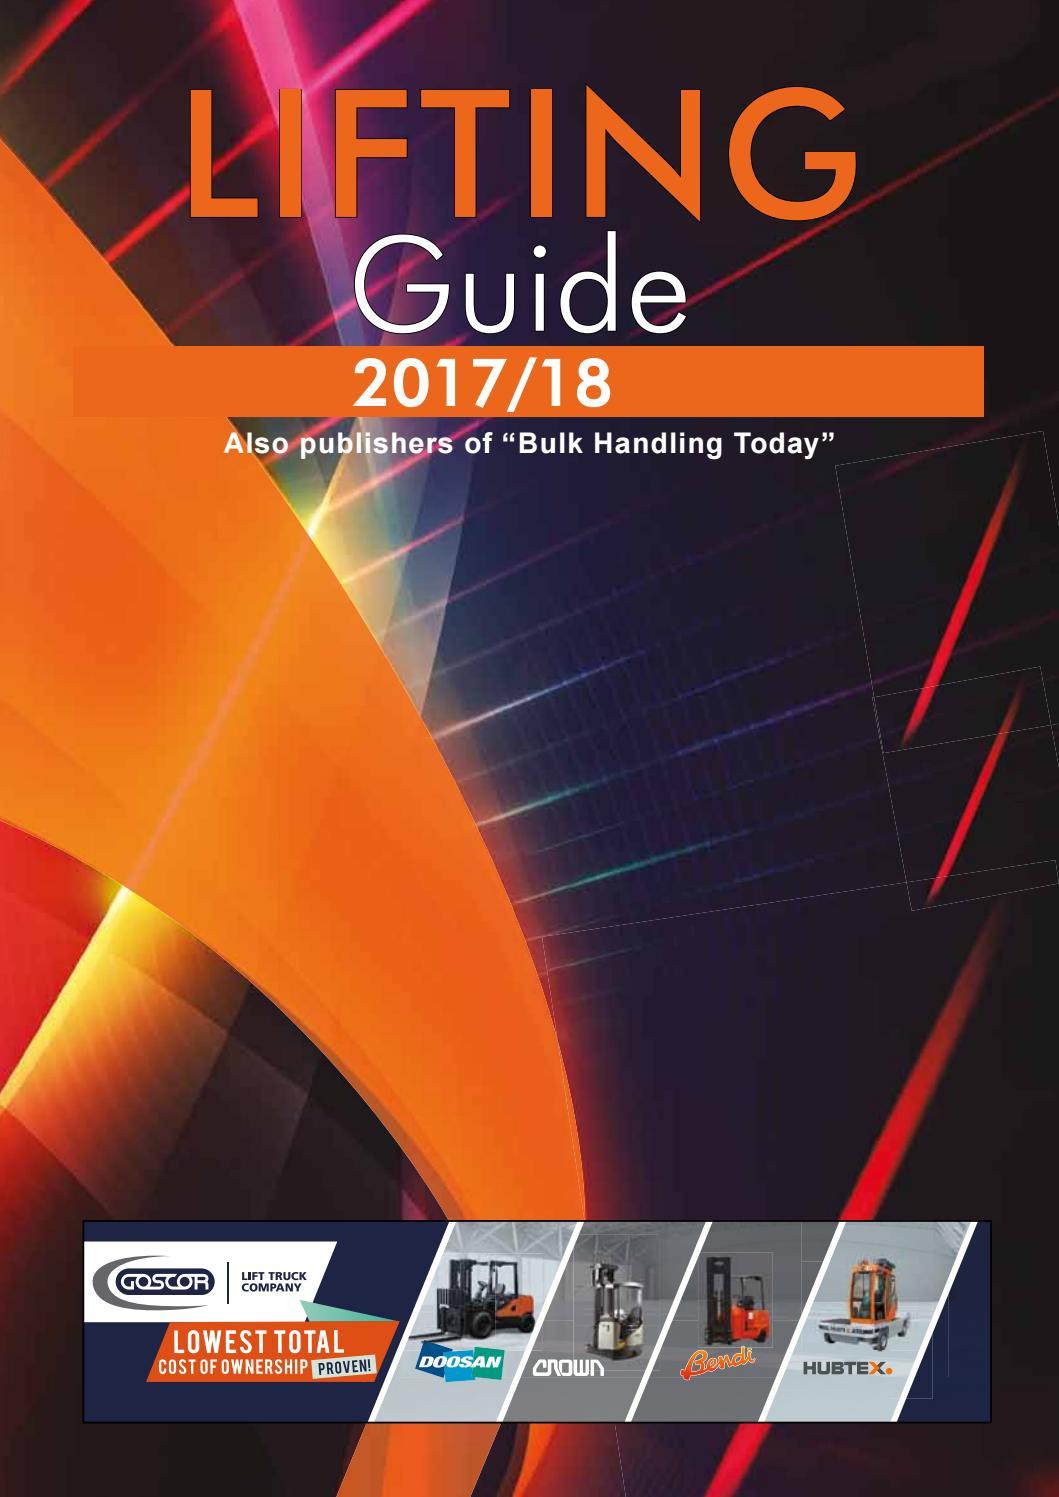 Bulk lifting guide 2017 by Promech Publishing - issuu